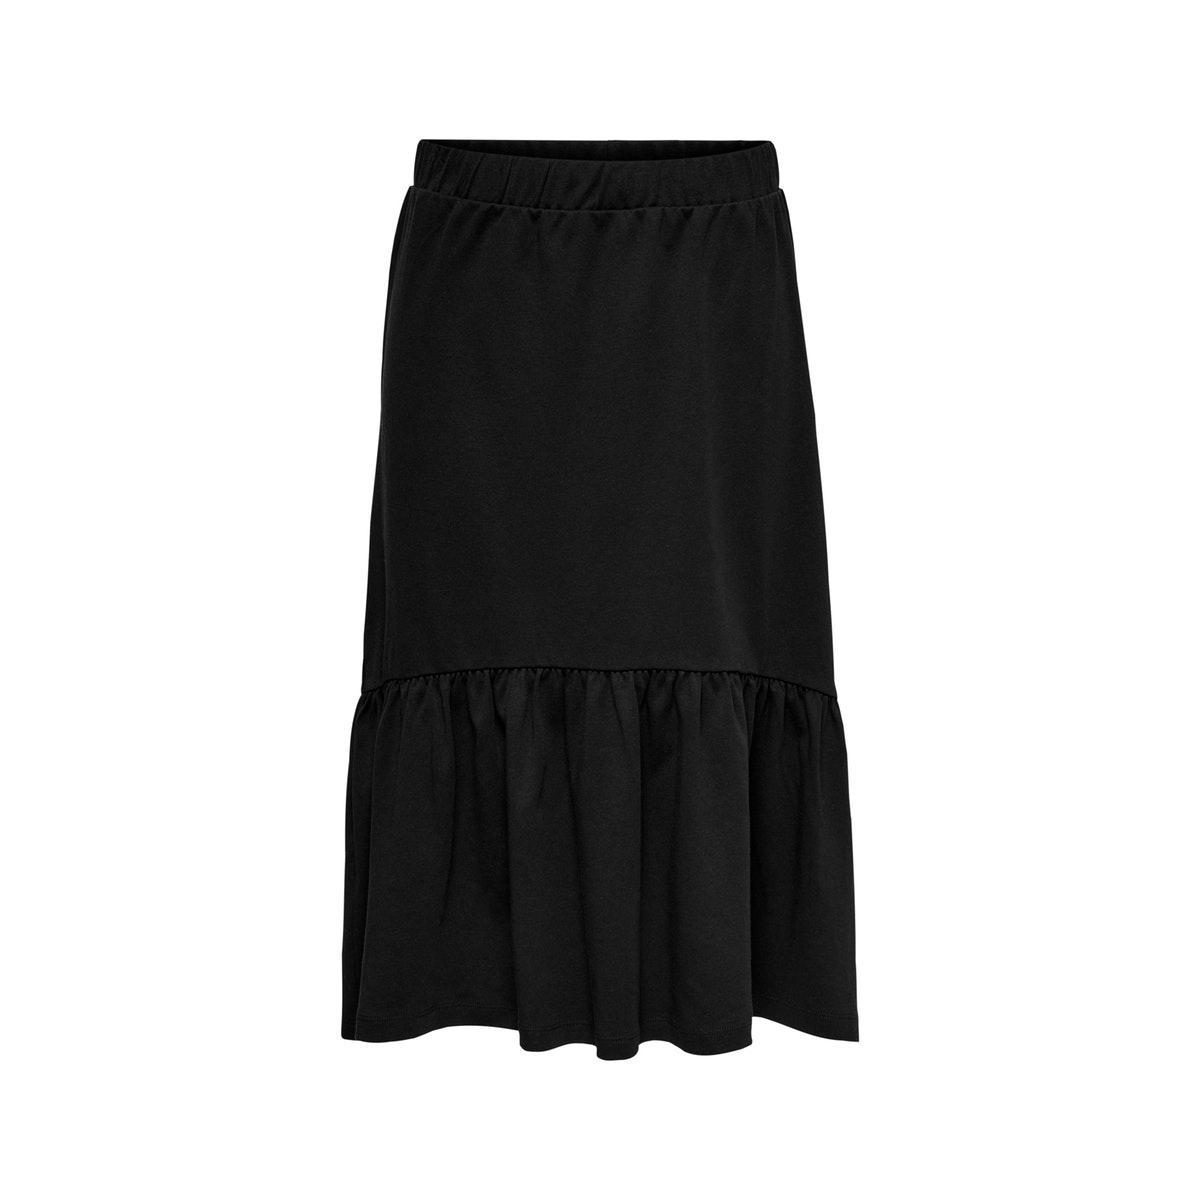 jdyrelax sweat skirt jrs exp 15214013 jacqueline de yong rok black